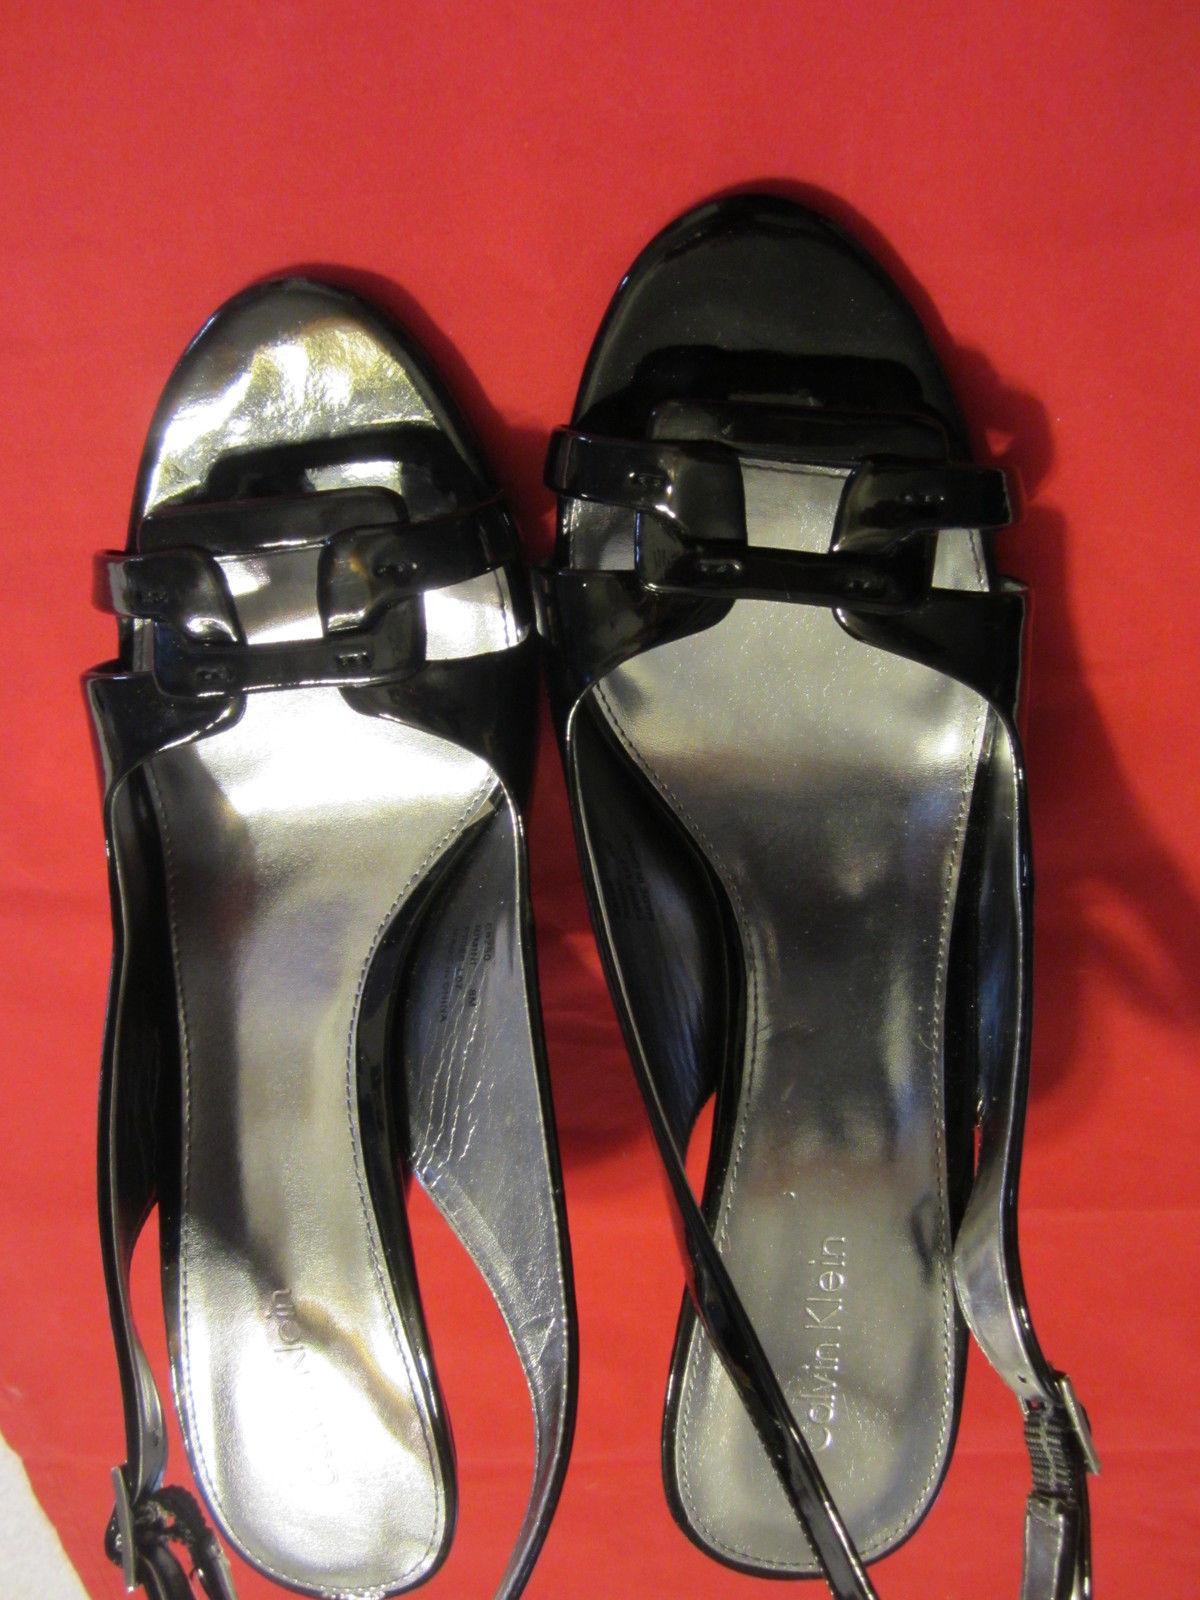 7dd54912db0 Women s Calvin Klein Black Sandals size sz 8 and 13 similar items. S l1600